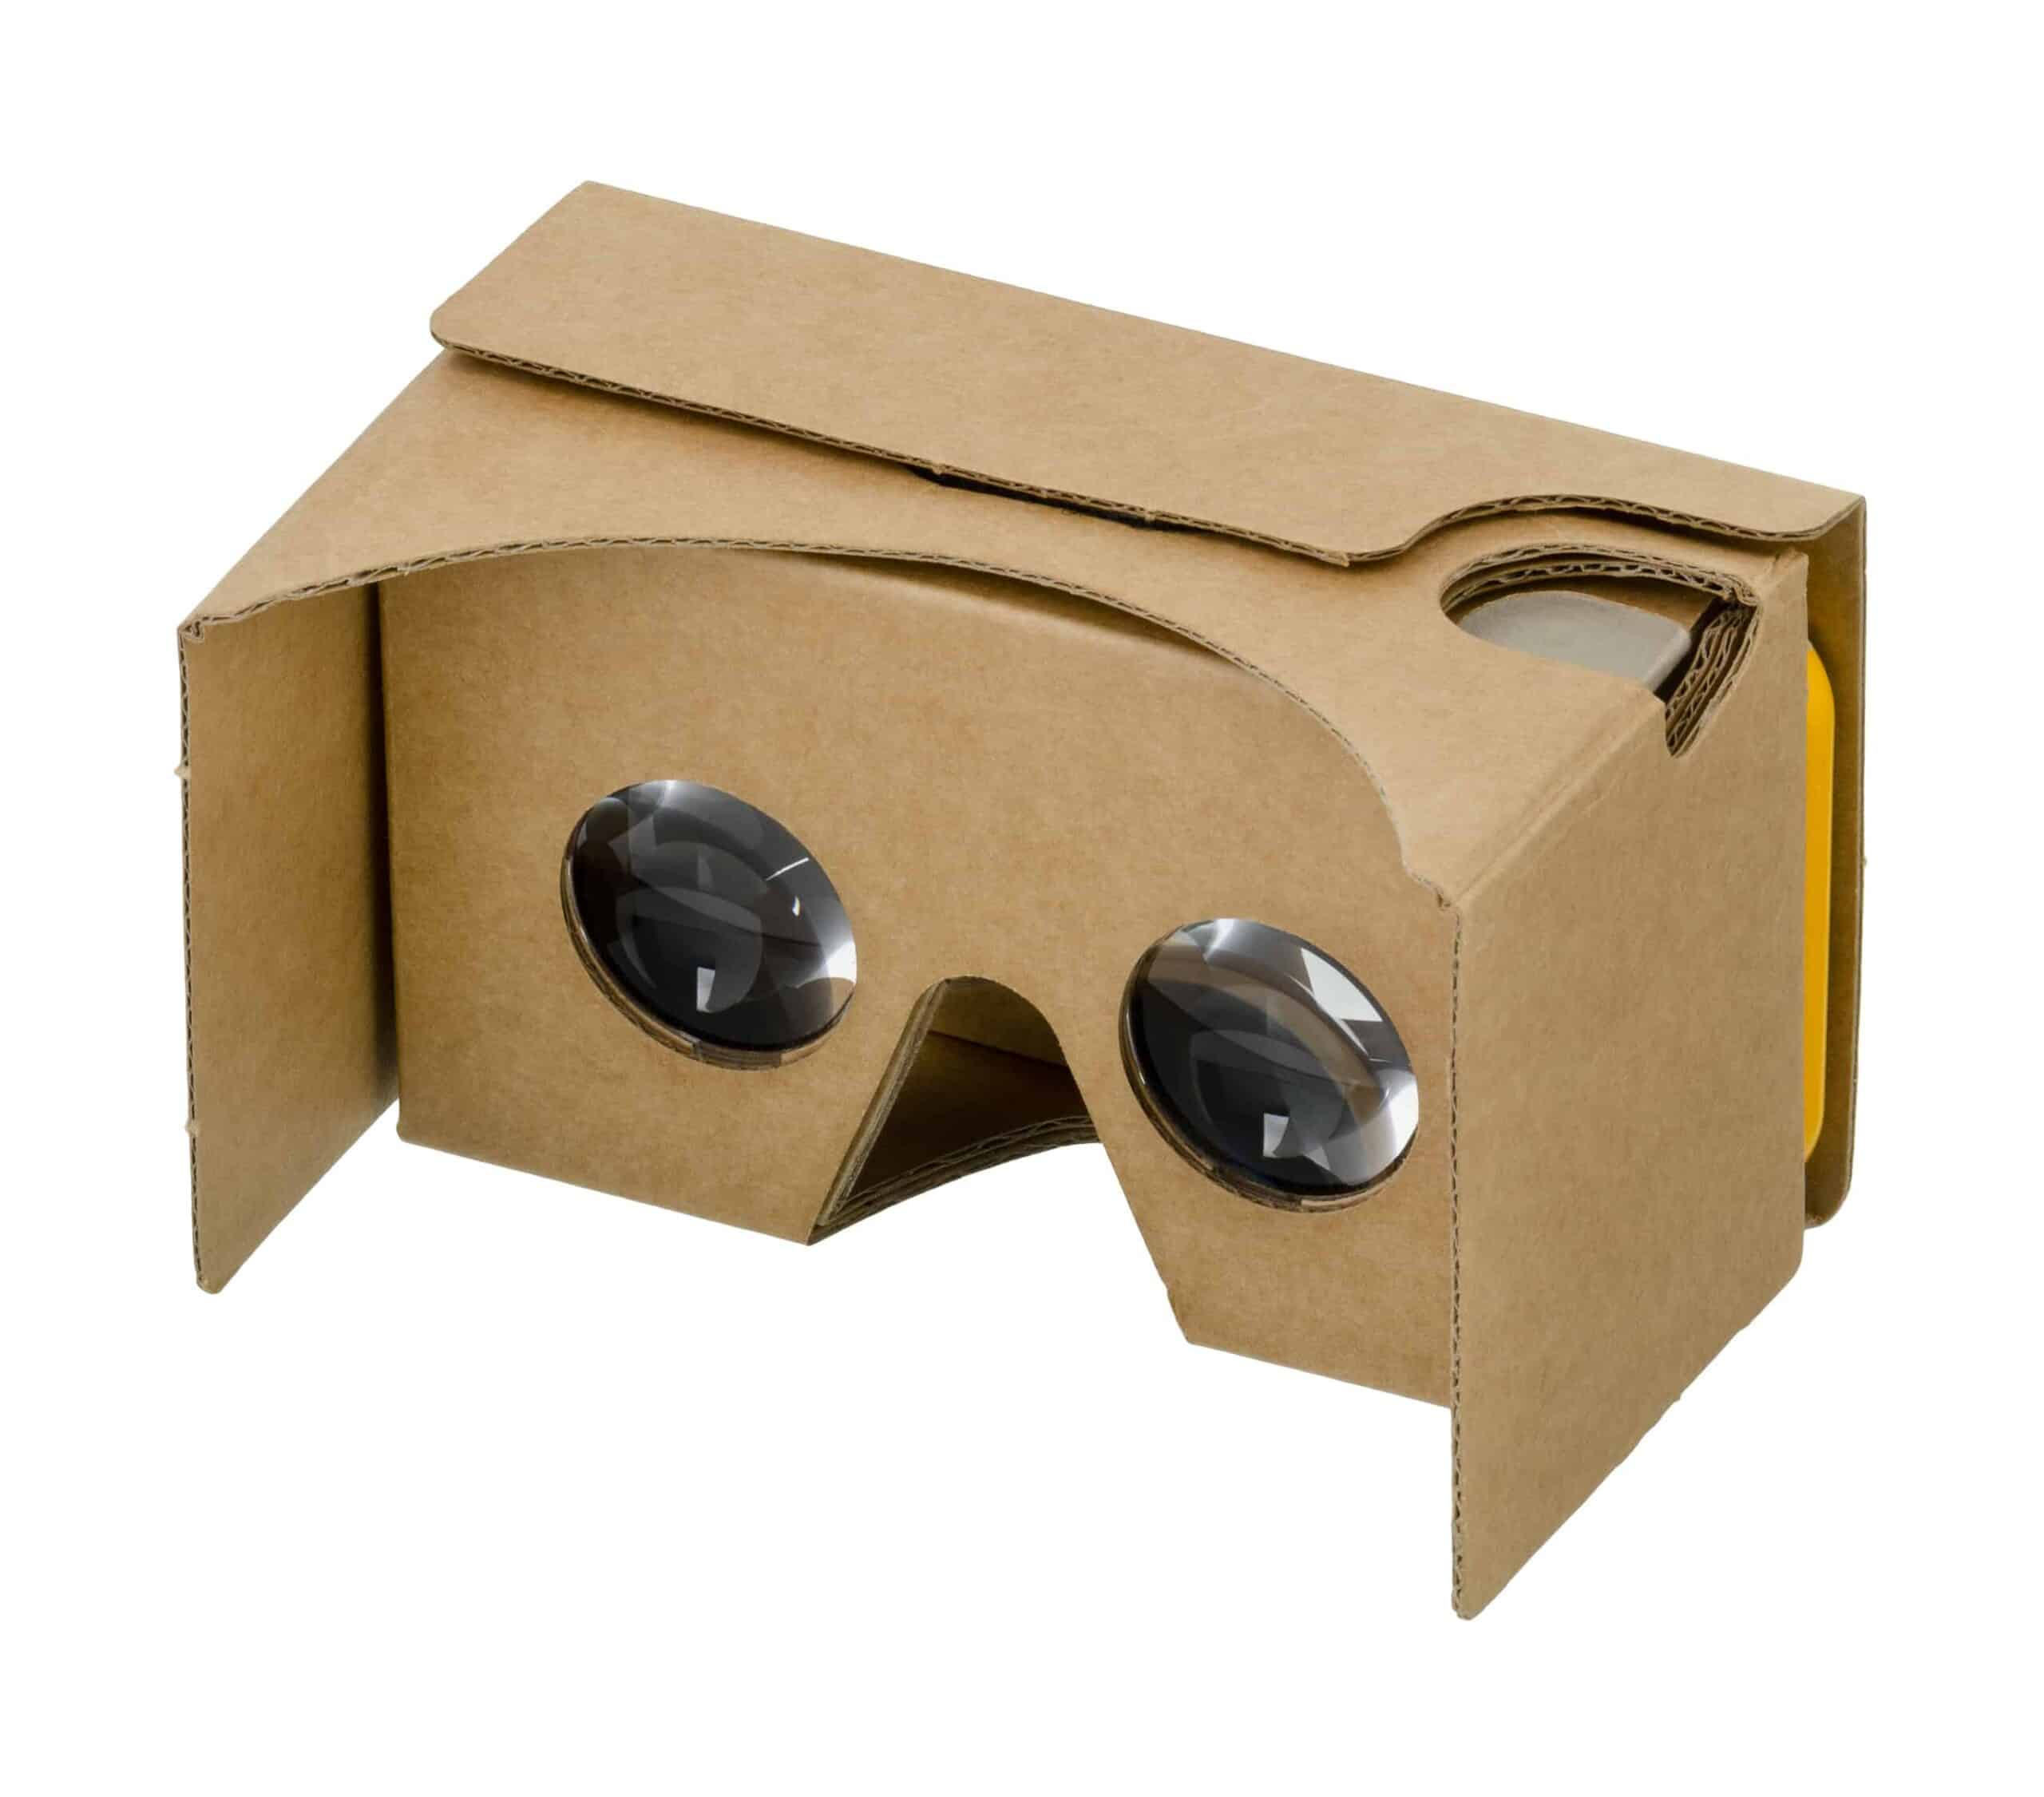 Google Cardboard Headset for VR